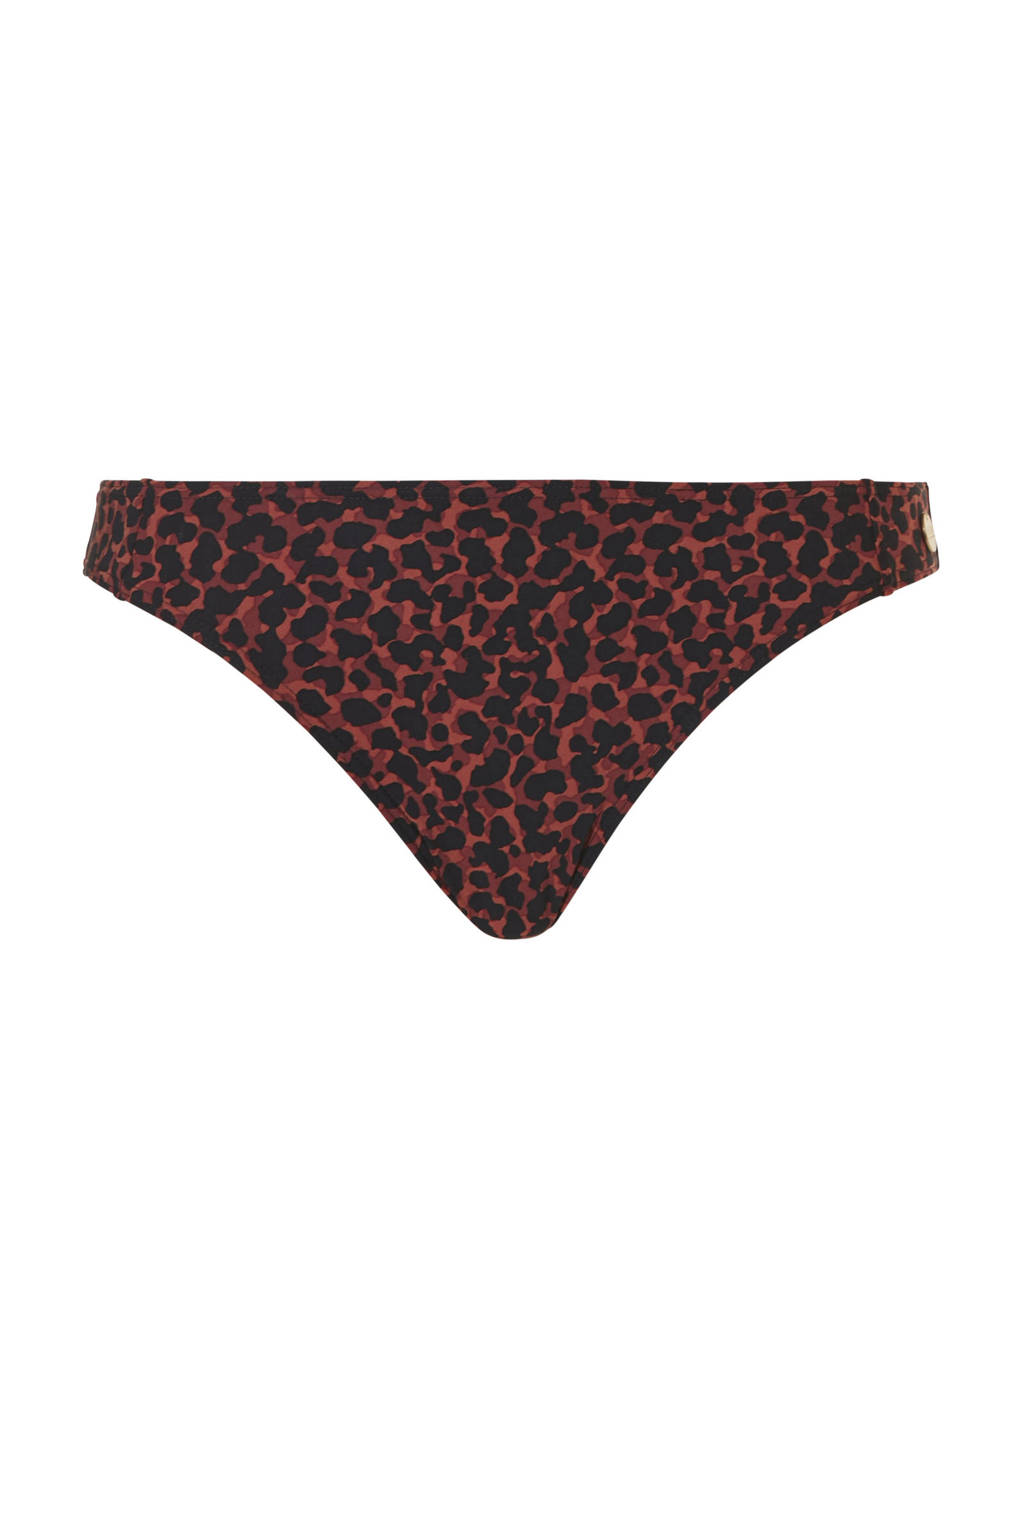 TC WOW bikinibroekje met panterprint rood/zwart, Rood/zwart